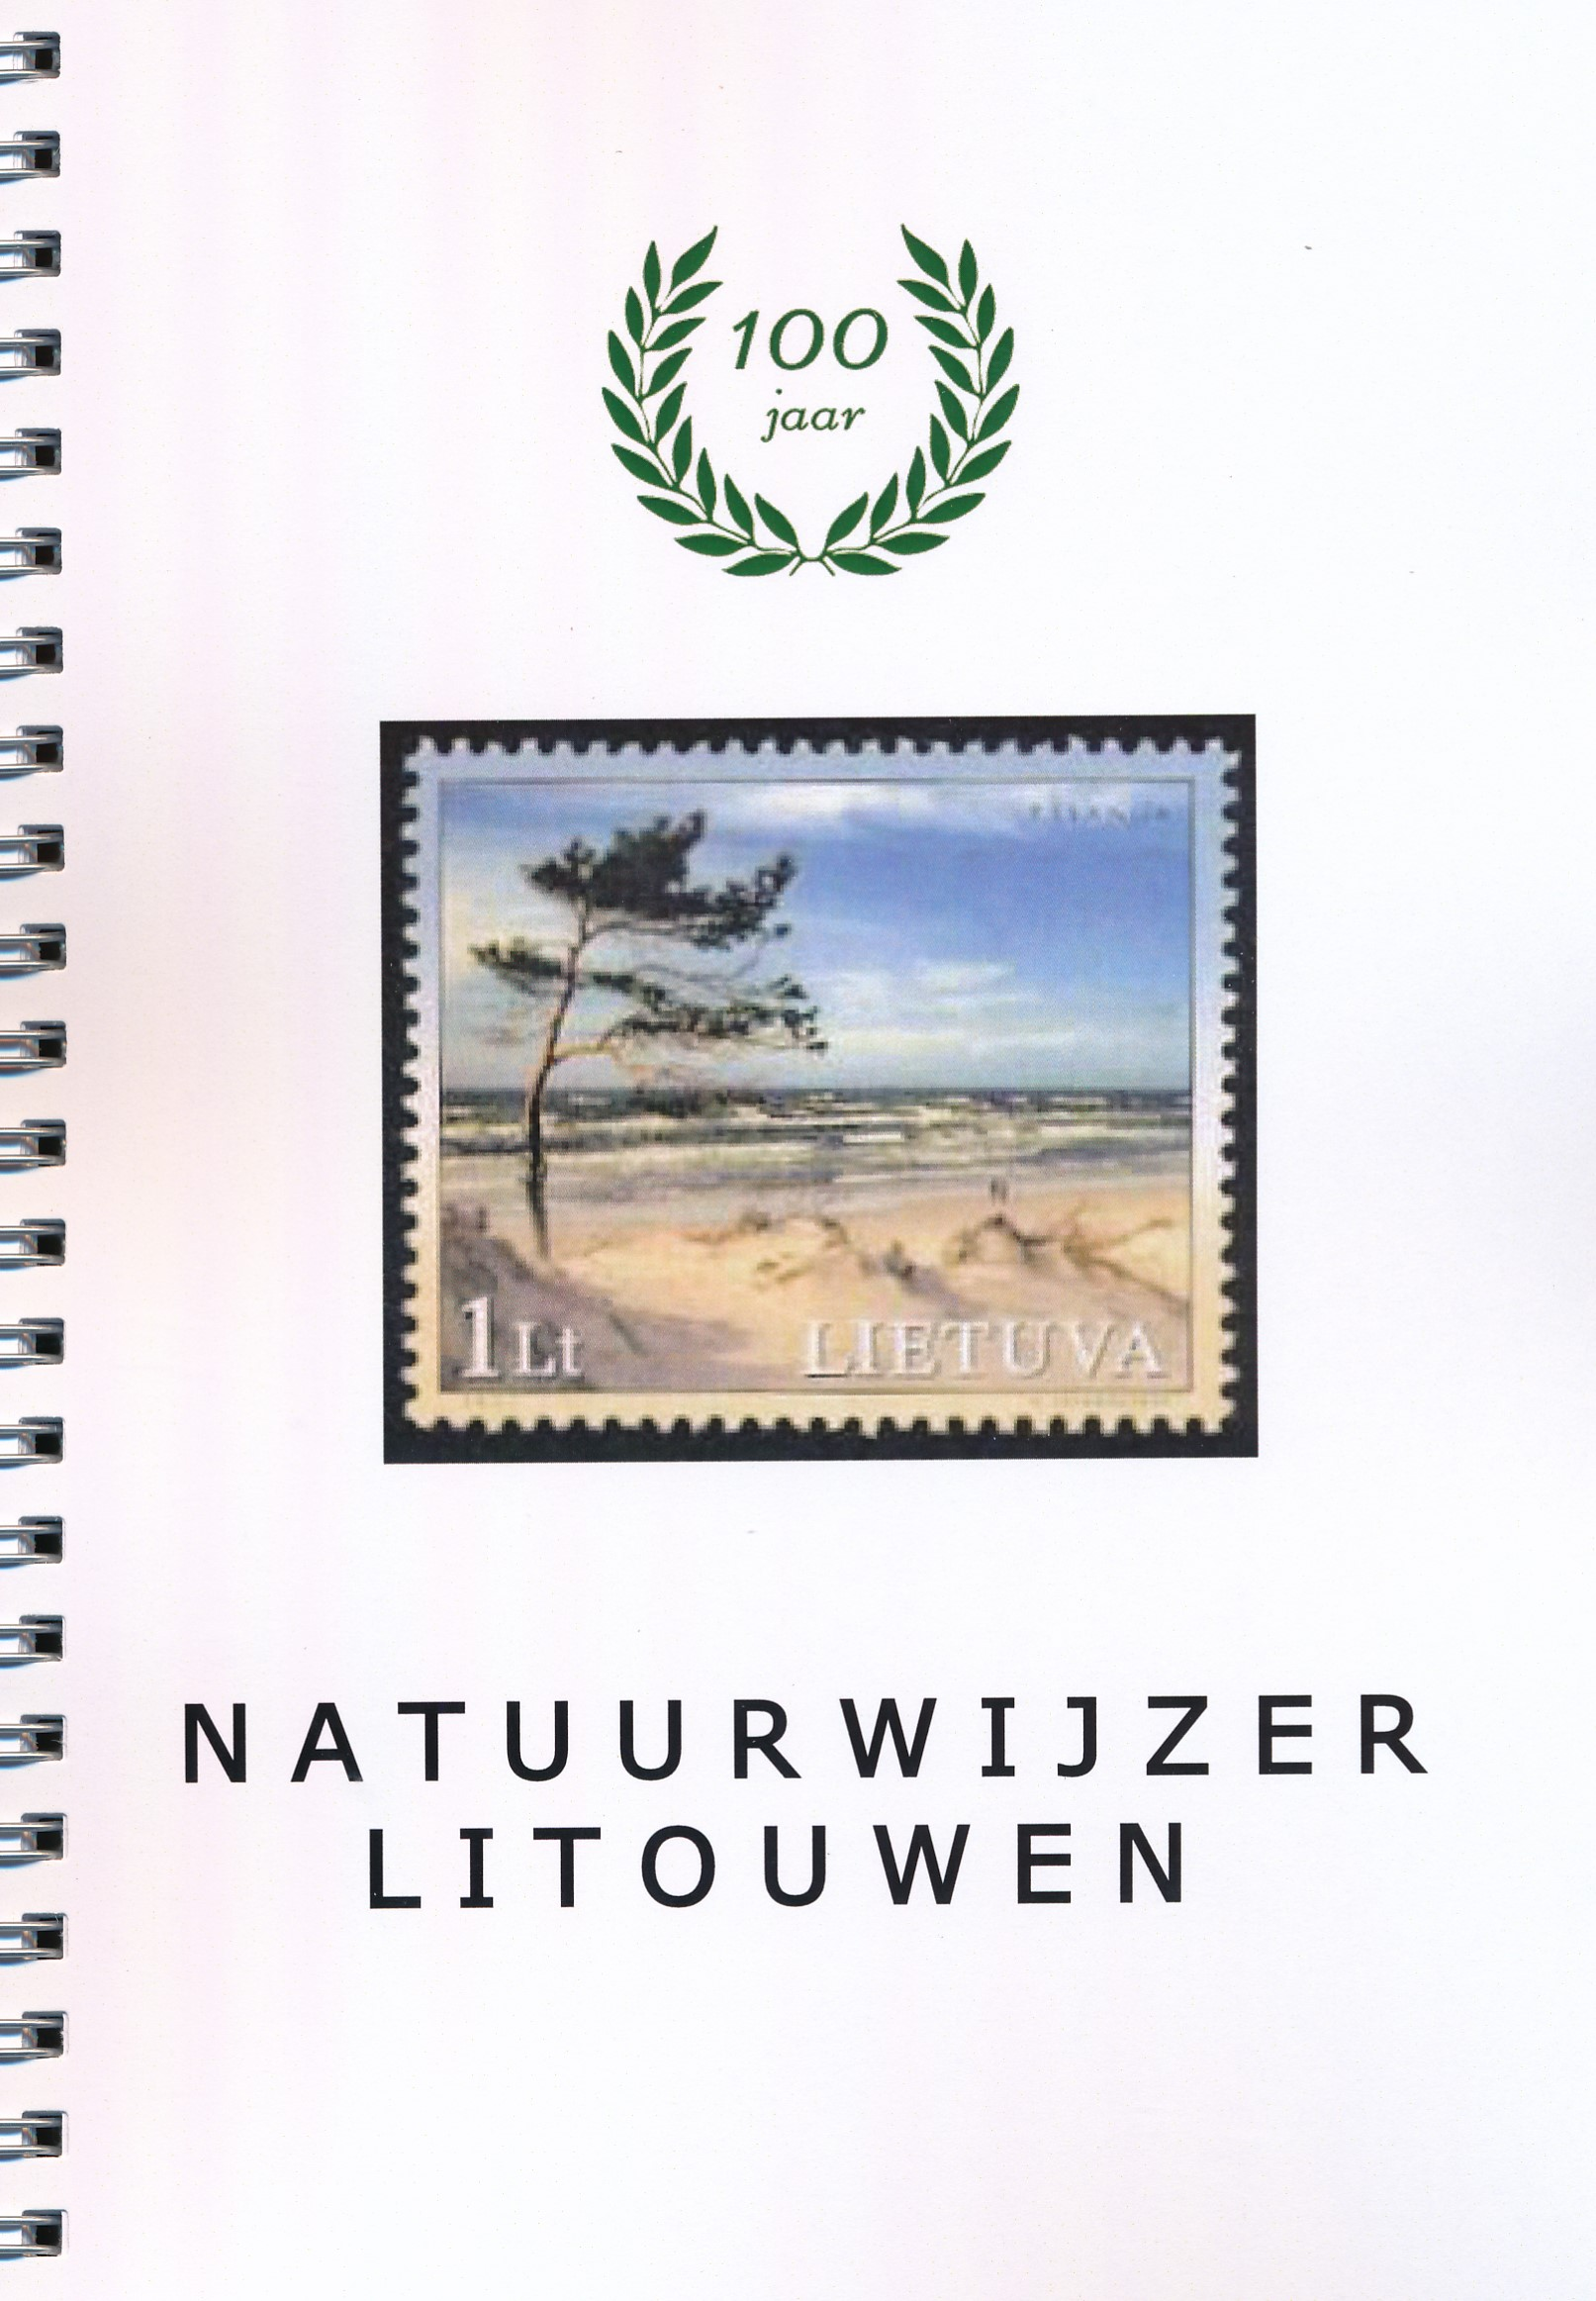 Natuurwijzer Litouwen JW LITOUWEN Jochem Wouda Jochem Wouda   Natuurgidsen Litouwen